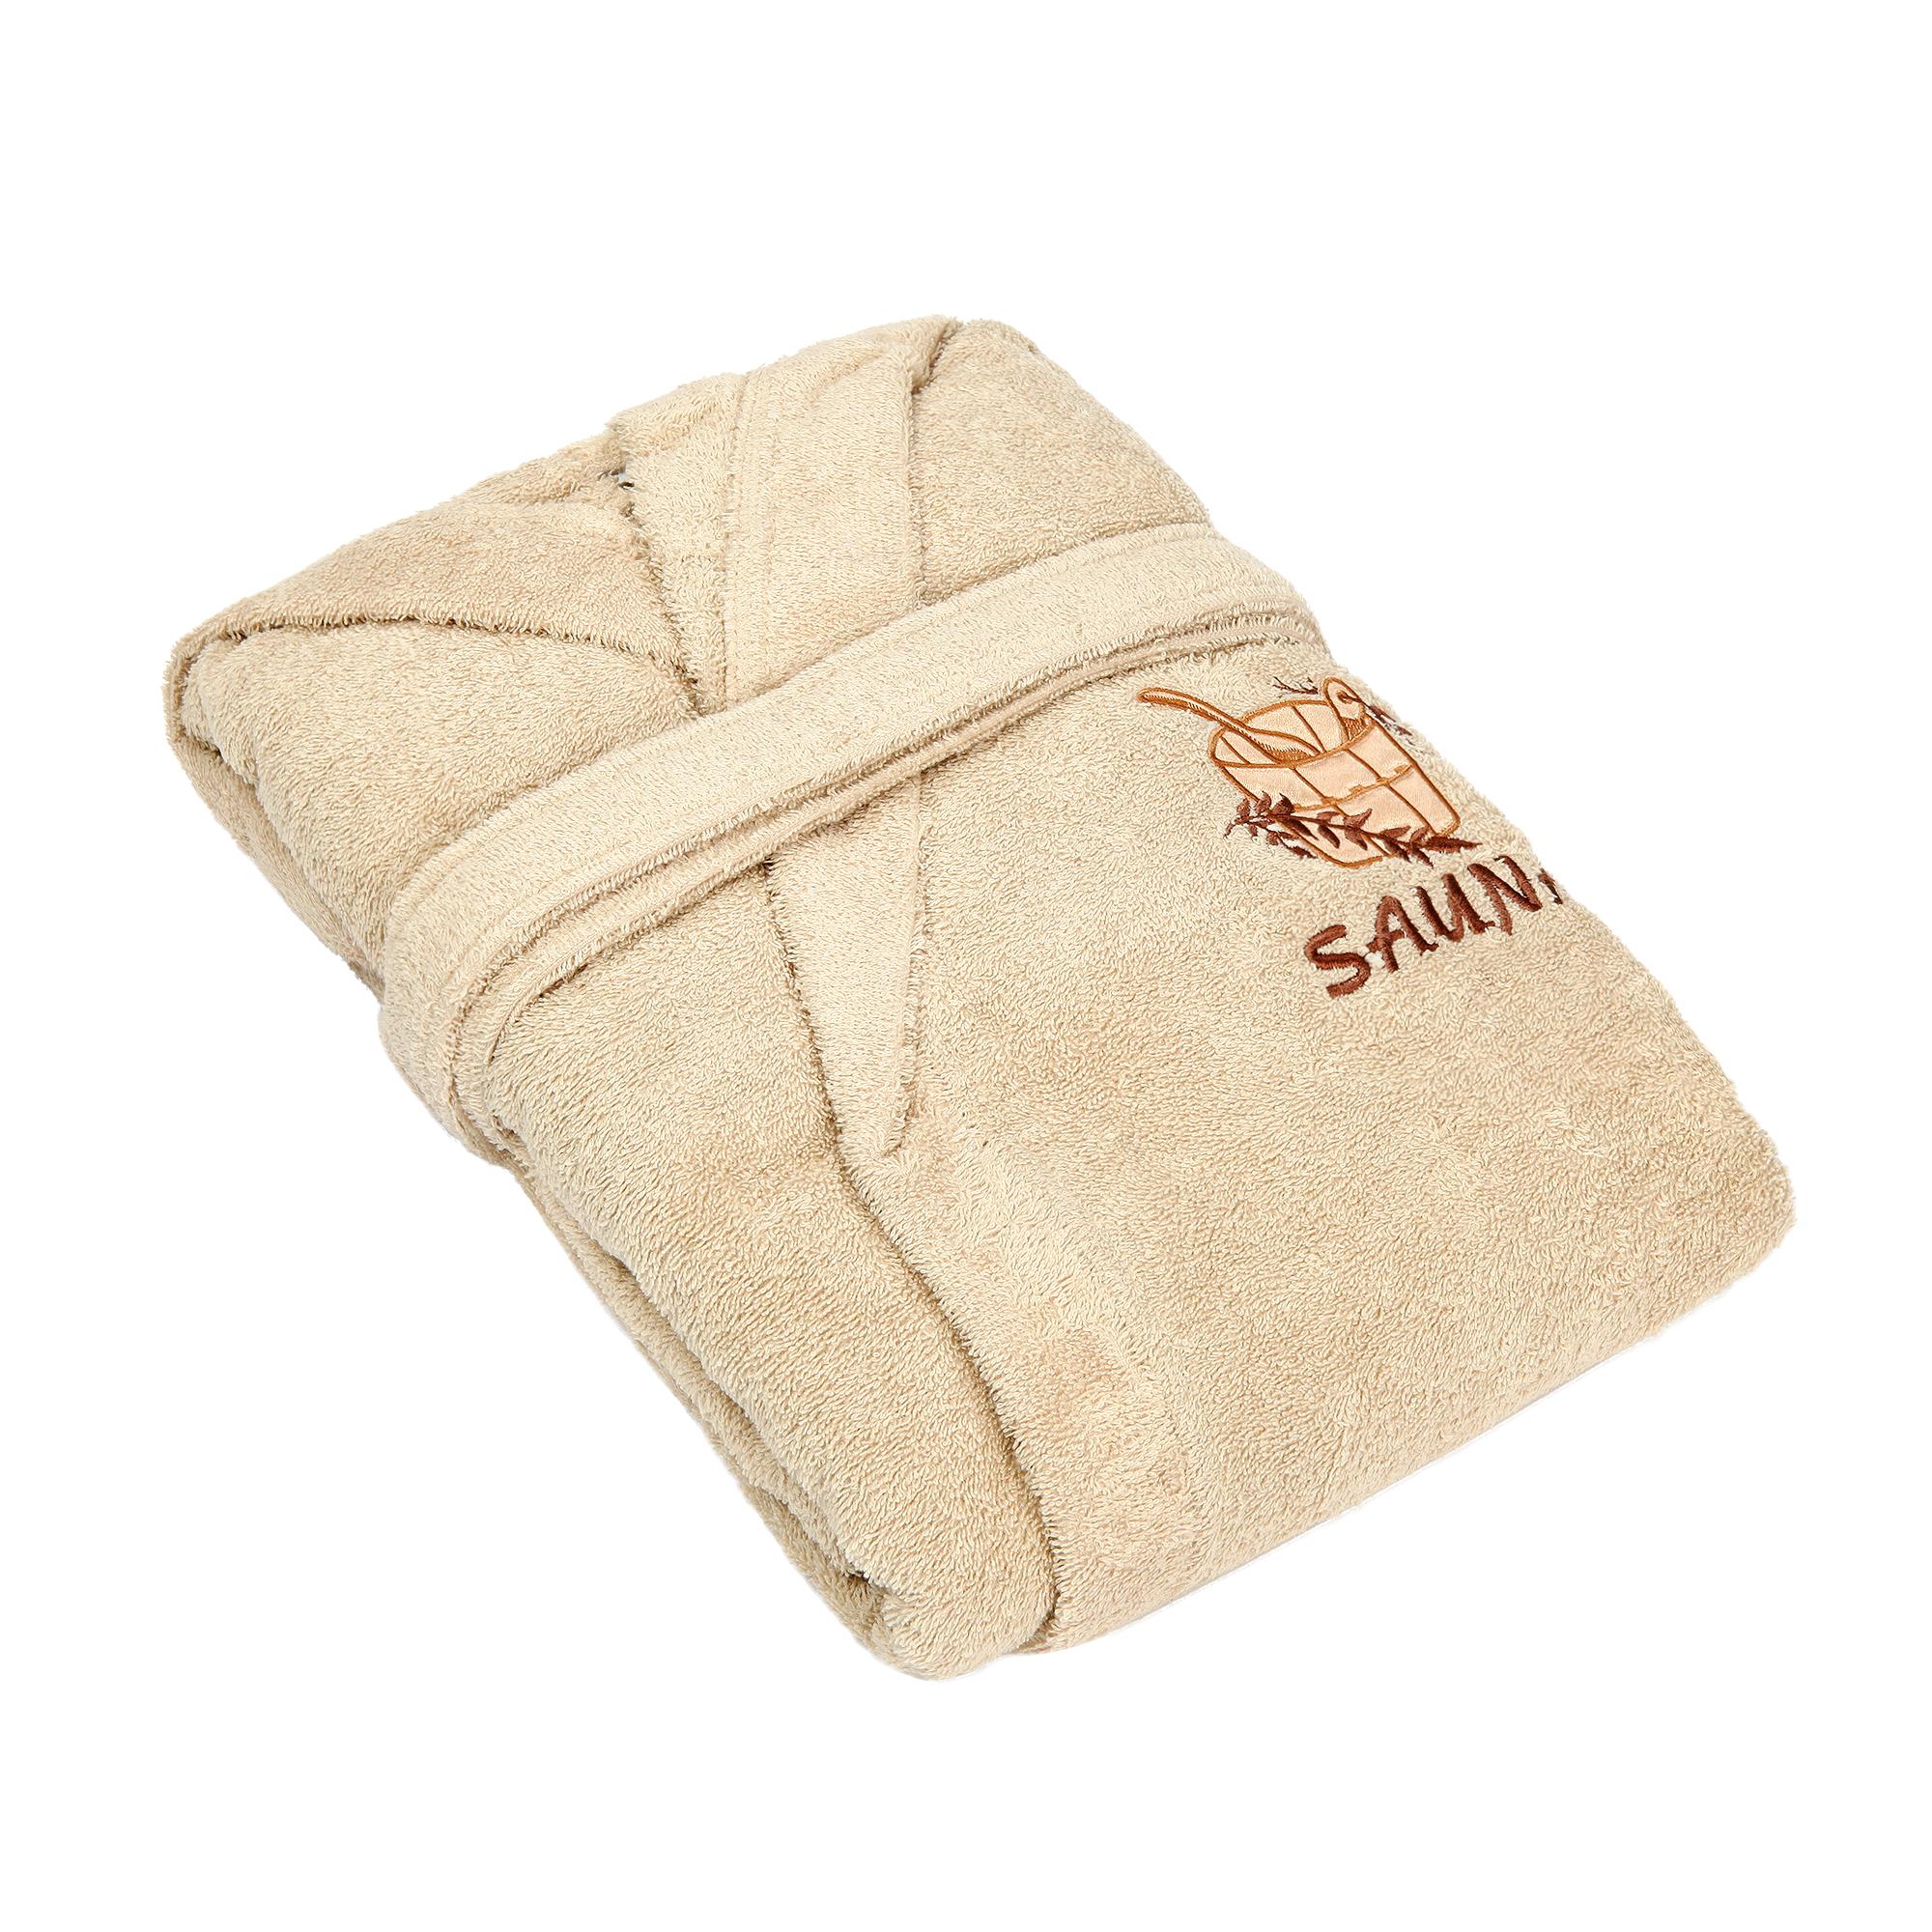 Фото - Халат мужской Asil sauna brown xxxl махровый с капюшоном халат махровый asil двухсторонний xxl темно синий